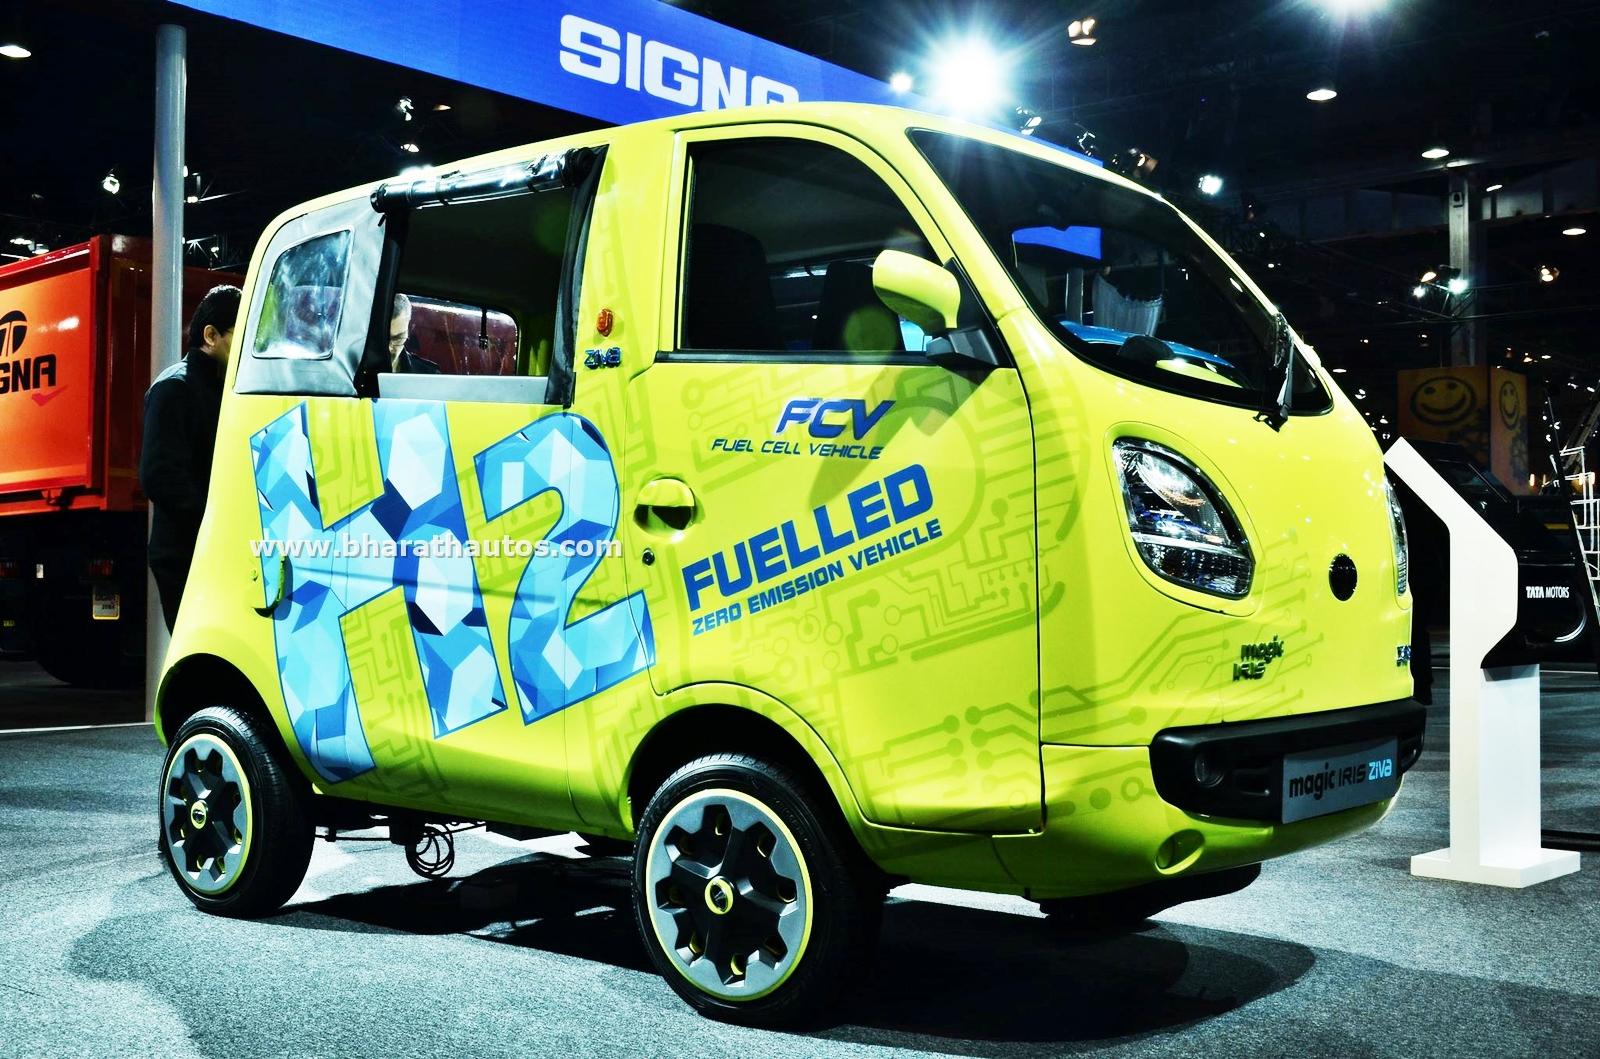 Tata Magic Iris Ziva Fuel Cell Pictures Photos Images Snaps 2016